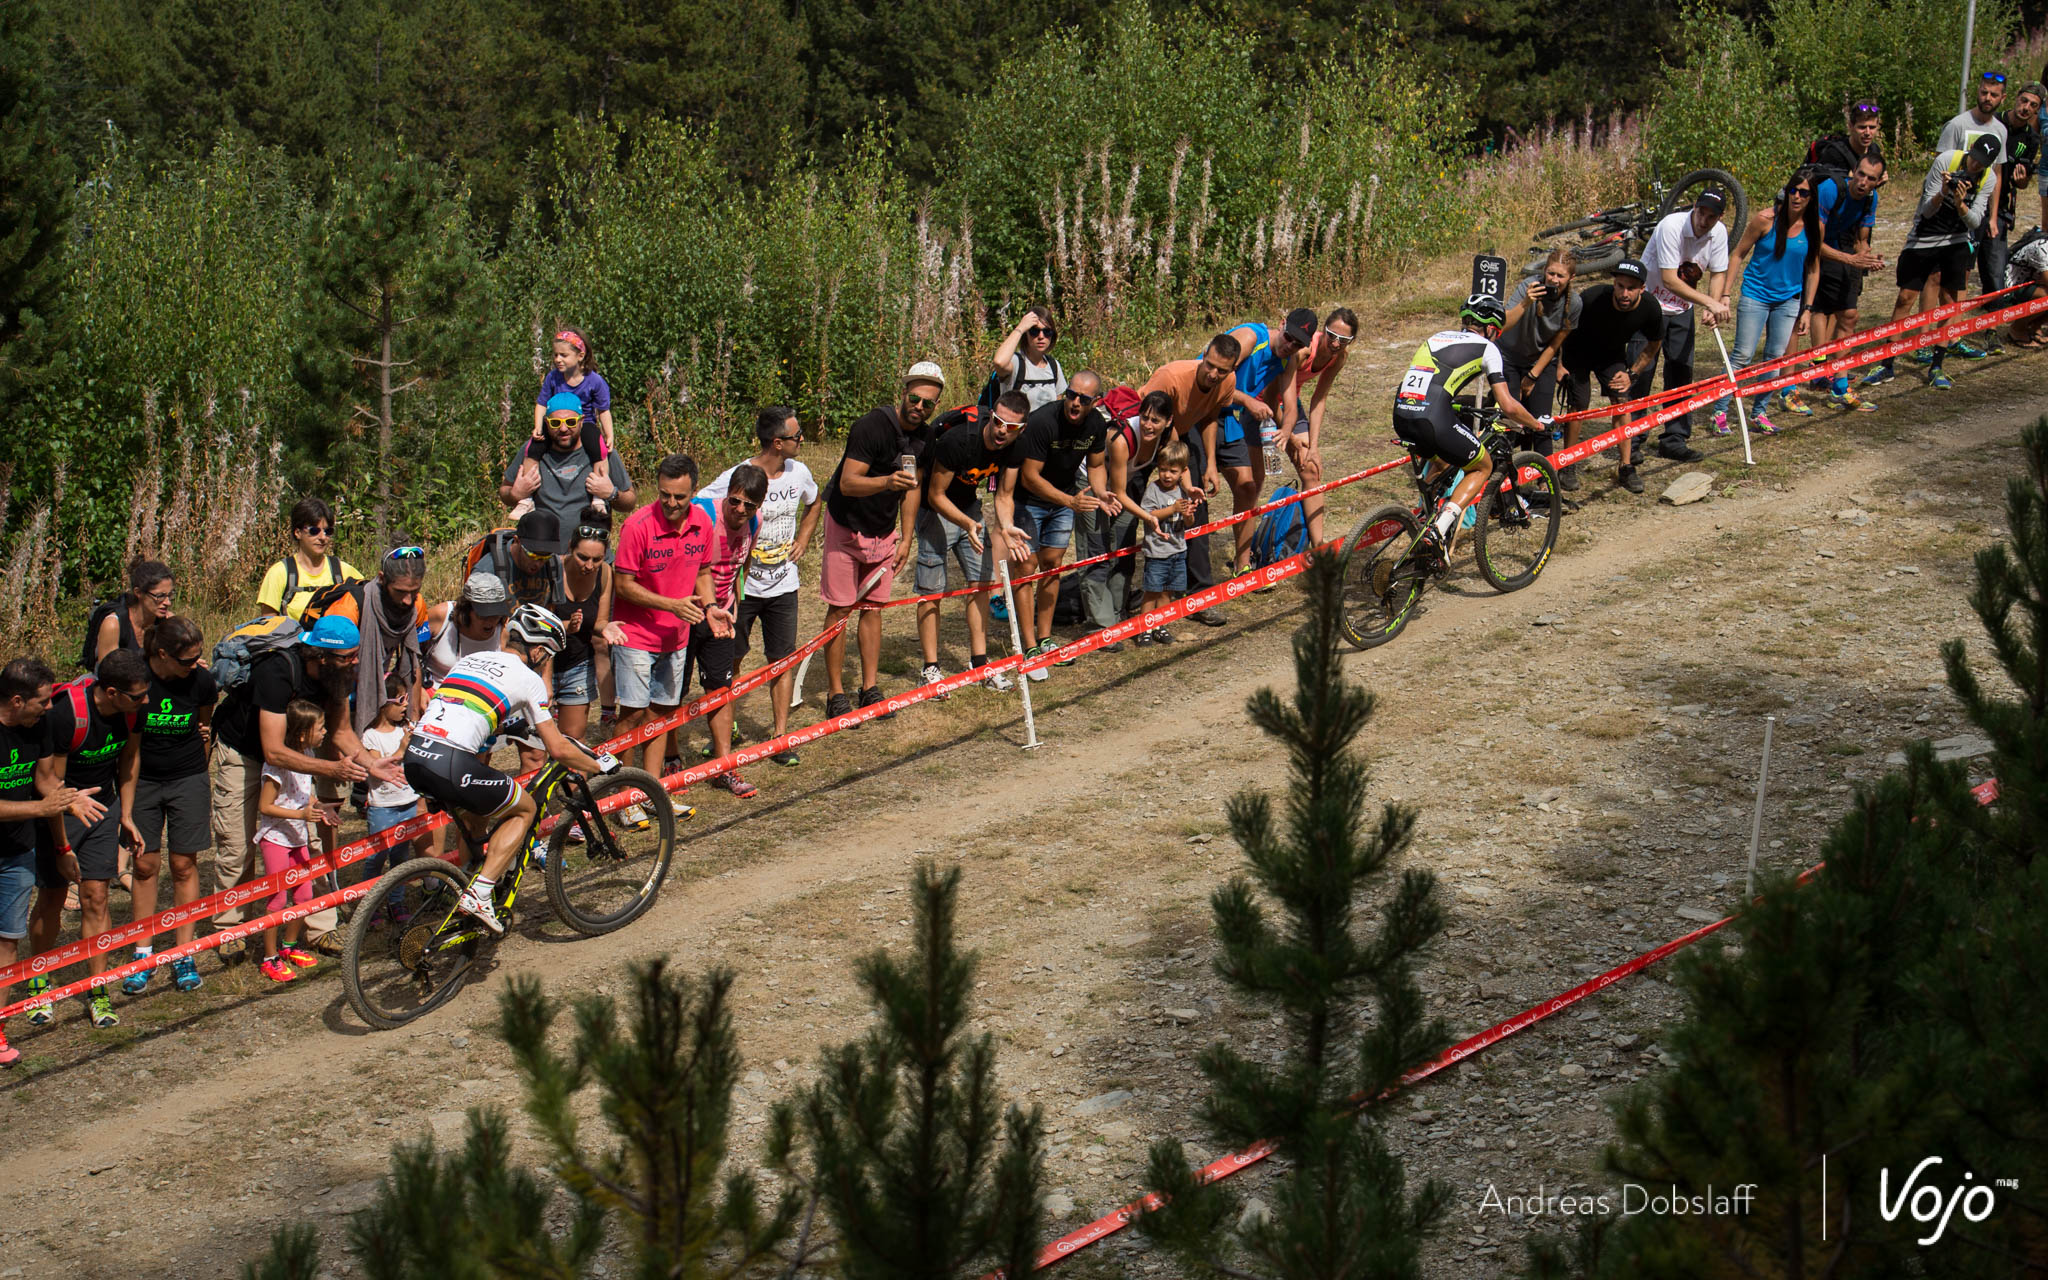 2, Schurter, Nino, Scott-Odlo, , SUI 21, Cink, Ondrej, Multivan Merida Biking Team, , CZE